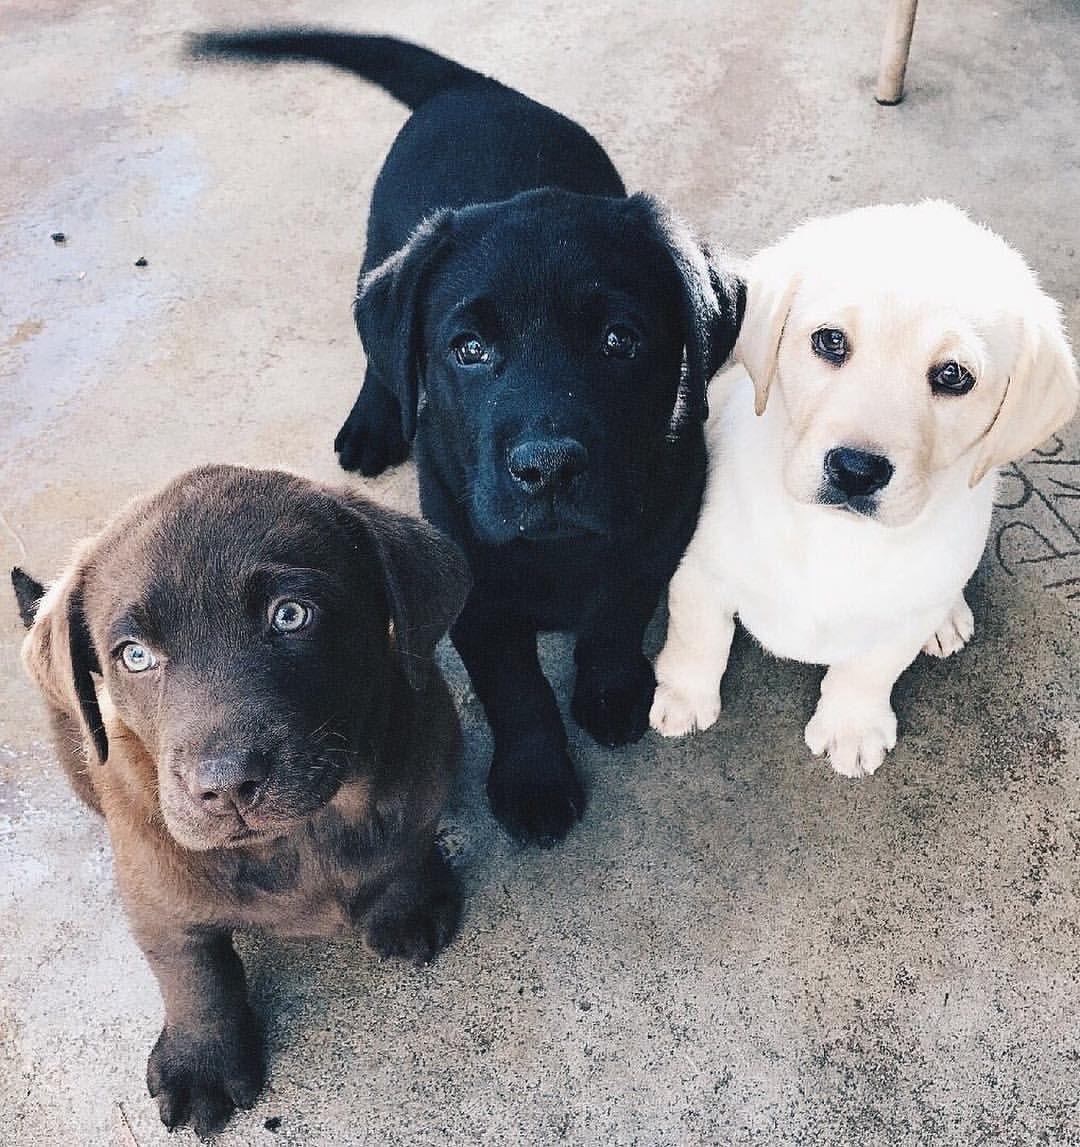 14 8k Likes 251 Comments Lulus Com Lulus On Instagram Squad Goals Lovelulus Via Obi Theblacklab Labrador Retriever Puppies Cute Dogs Lab Puppies